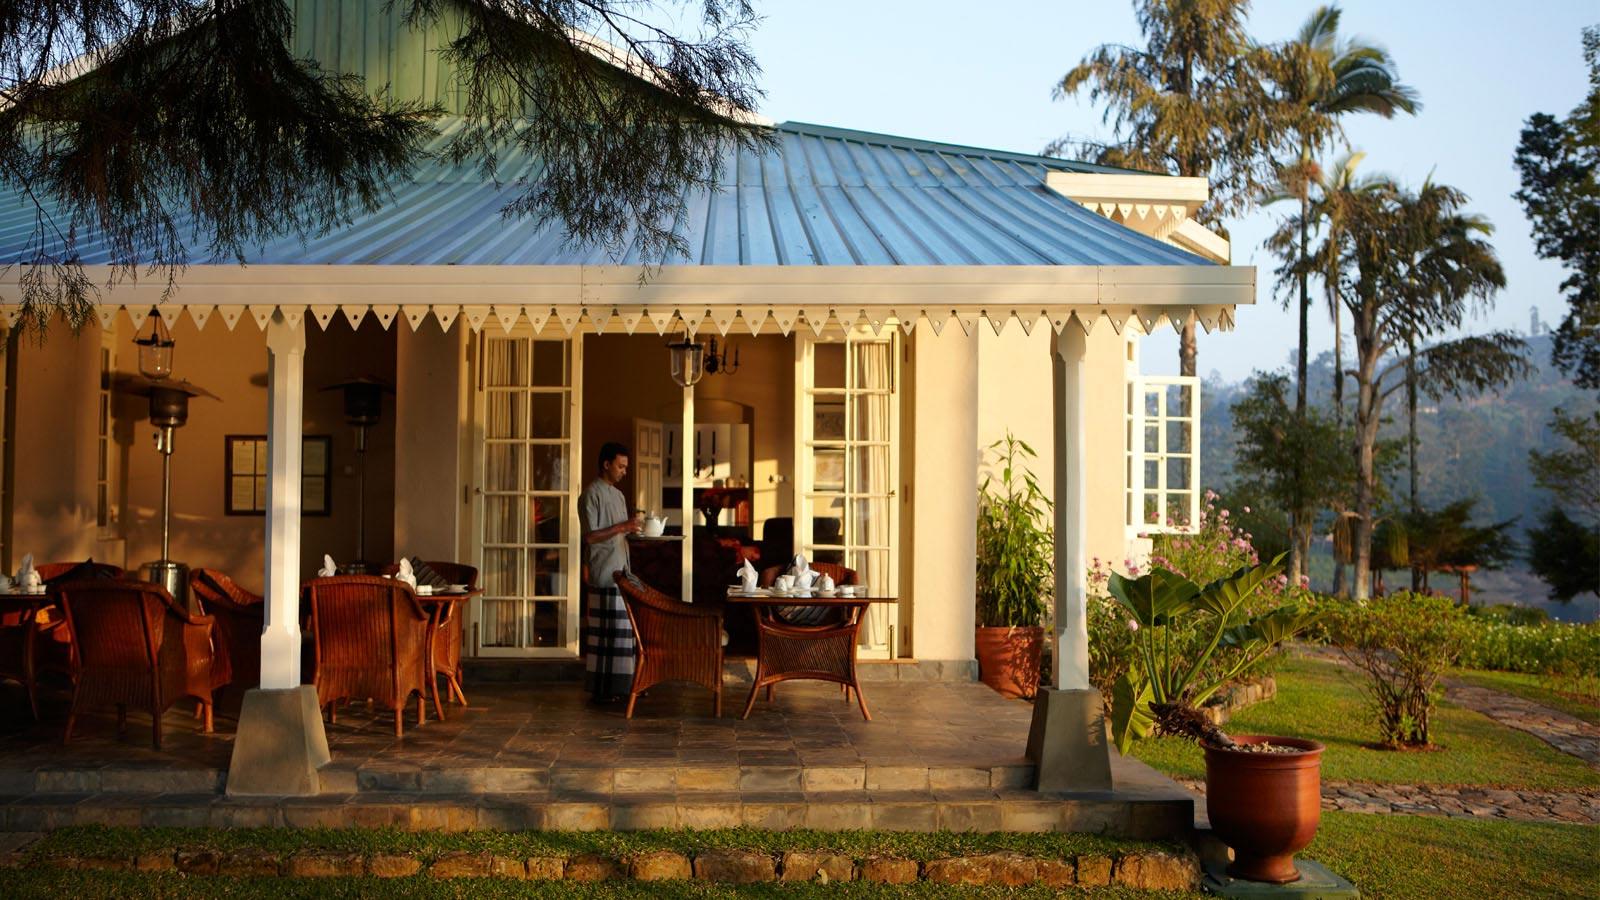 konyhasziget_ut_a_teahoz_setting-breakfast-on-terrace-castlereagh.jpg